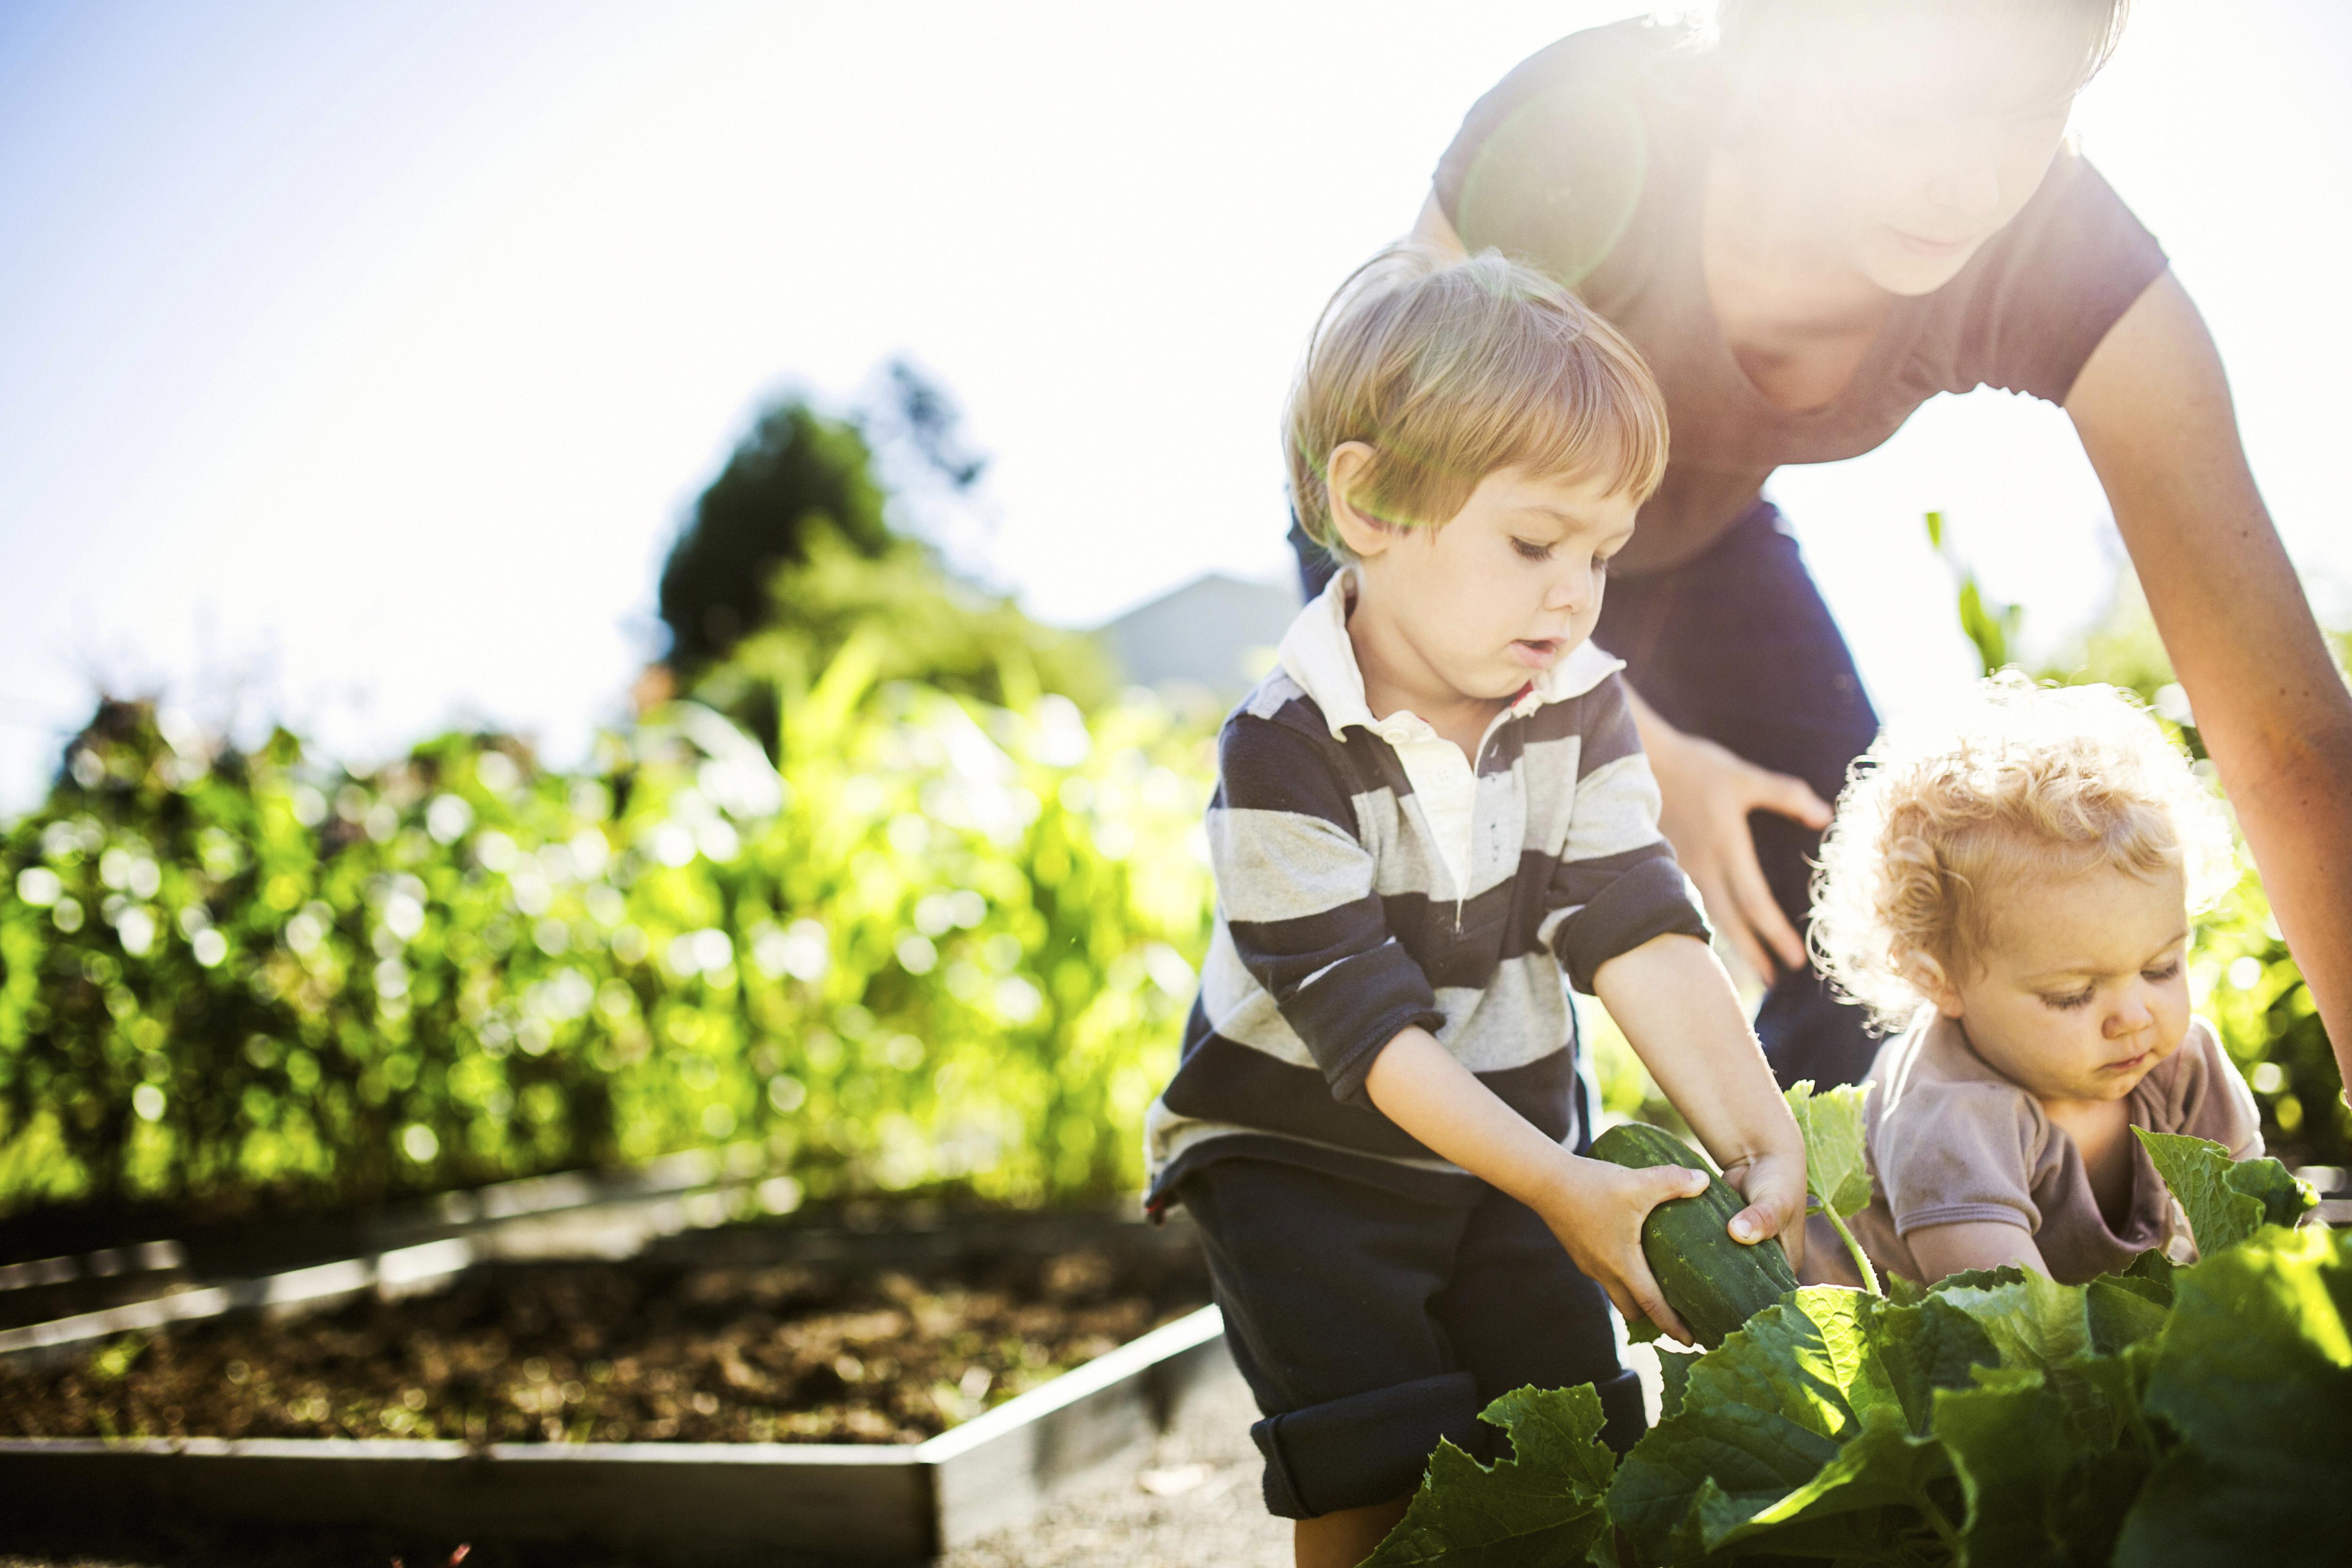 Diy Pesticides For Your Garden